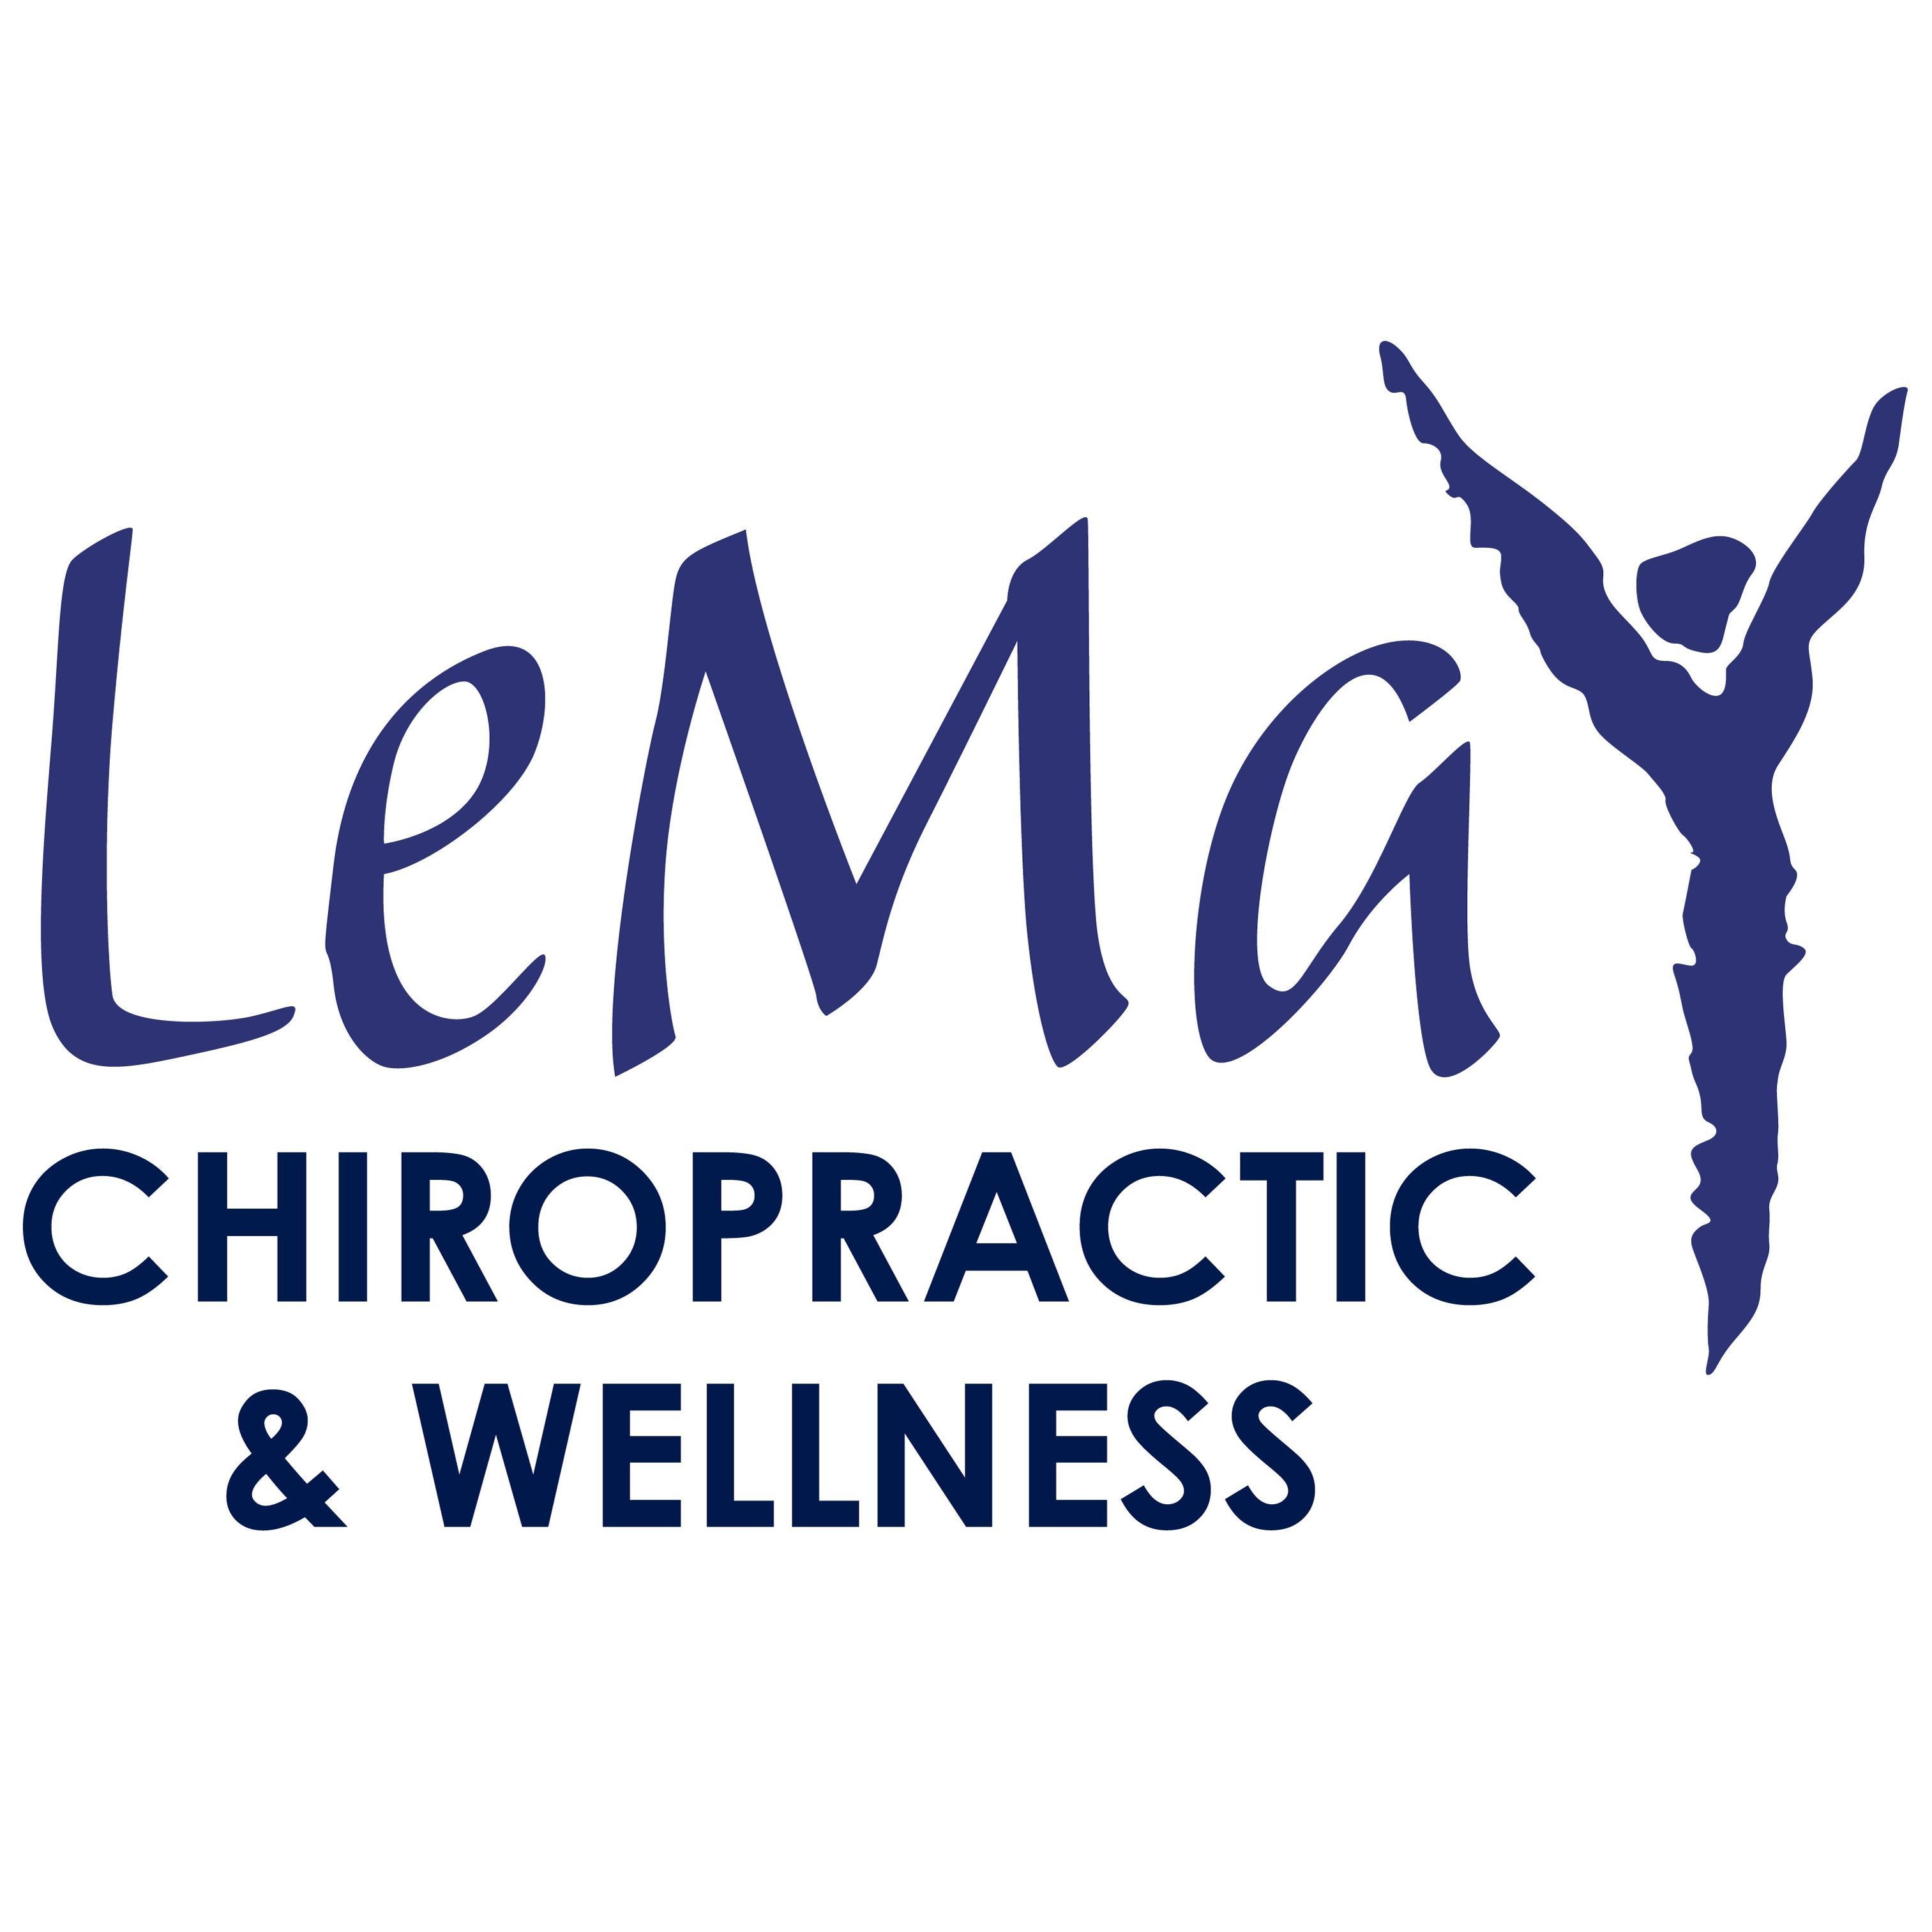 LeMay Chiropractic & Wellness